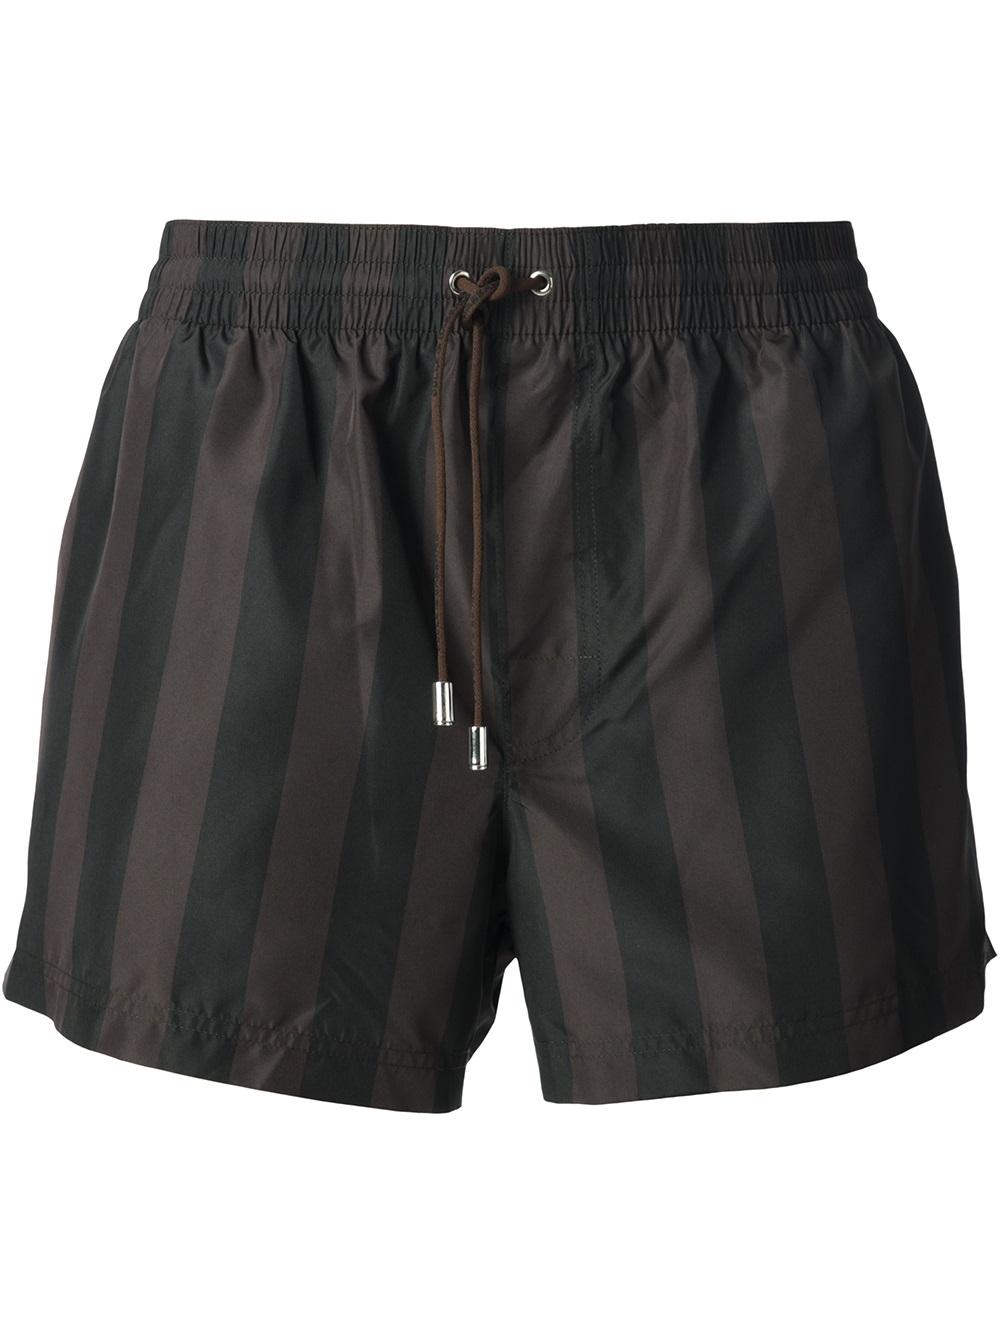 fe24c7f20e Dolce & Gabbana Striped Swim Shorts in Black for Men - Lyst